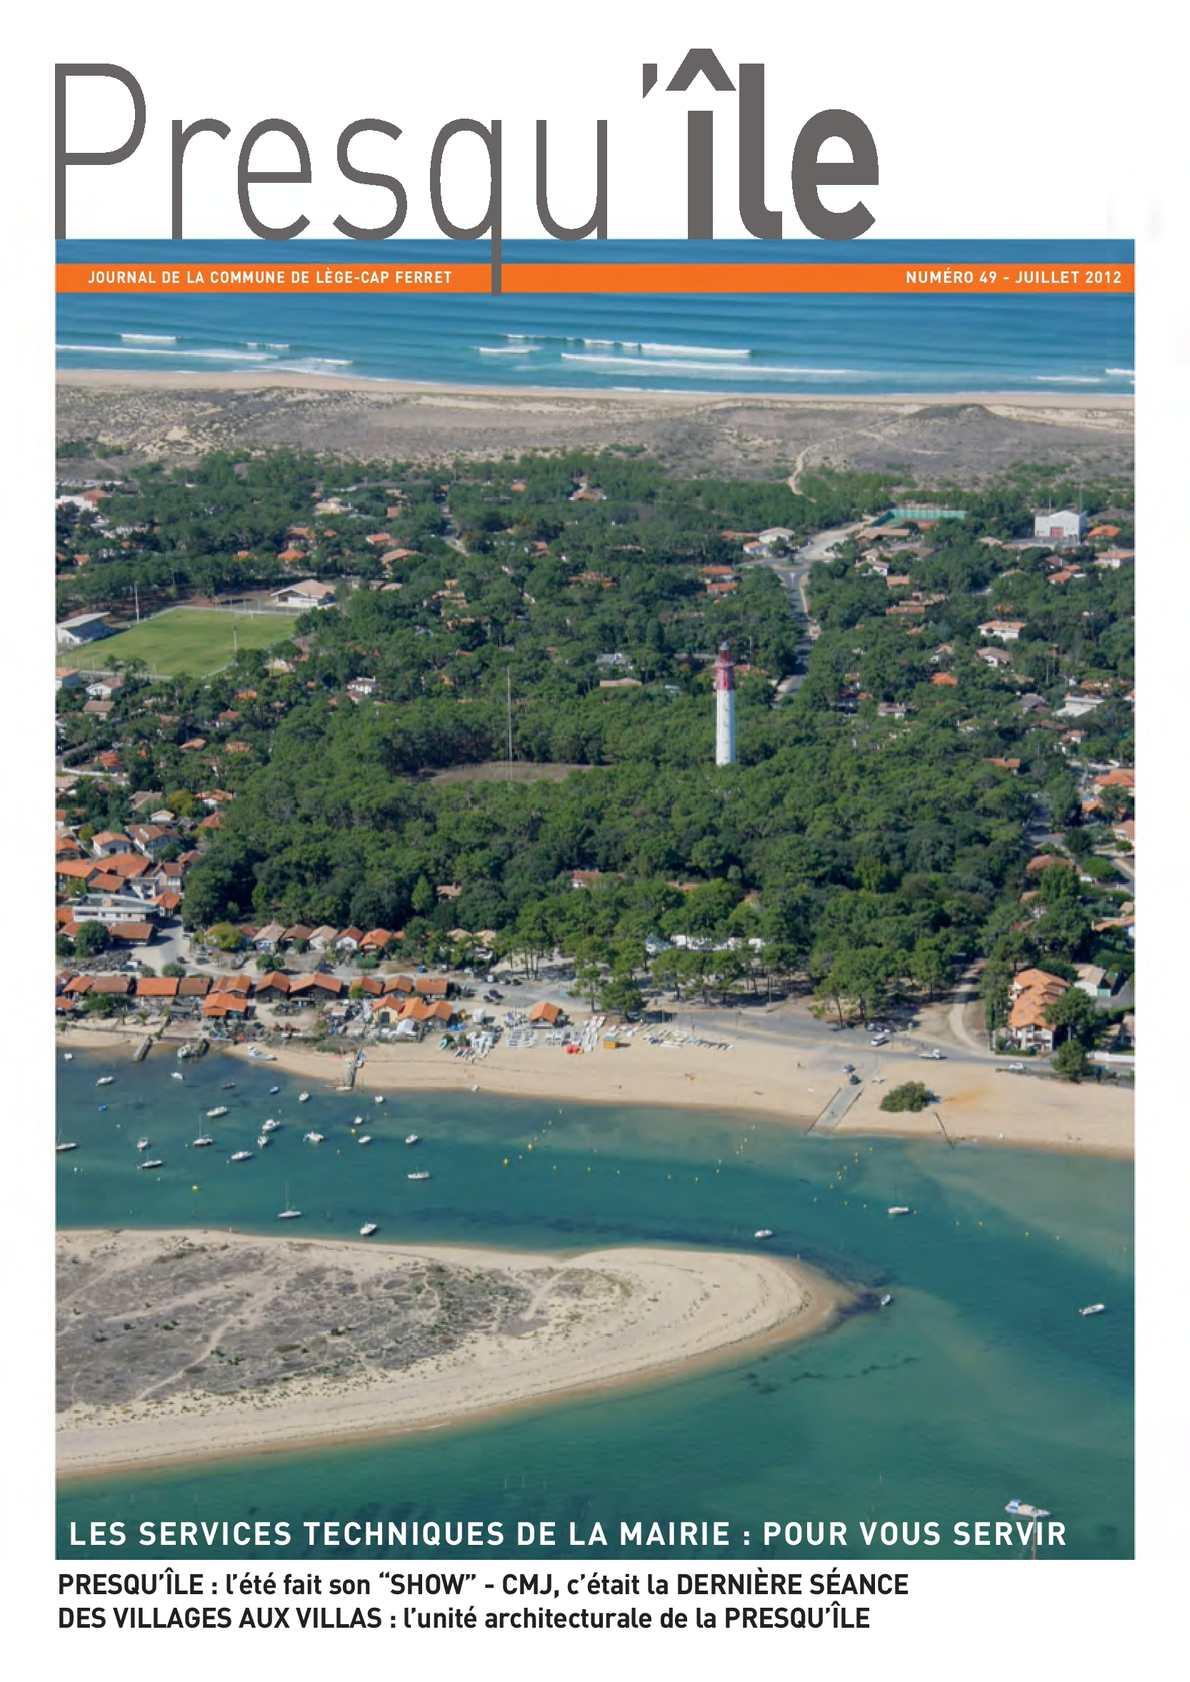 Calam o revue municipale de l ge cap ferret n 49 t 2012 - Office du tourisme de lege cap ferret ...